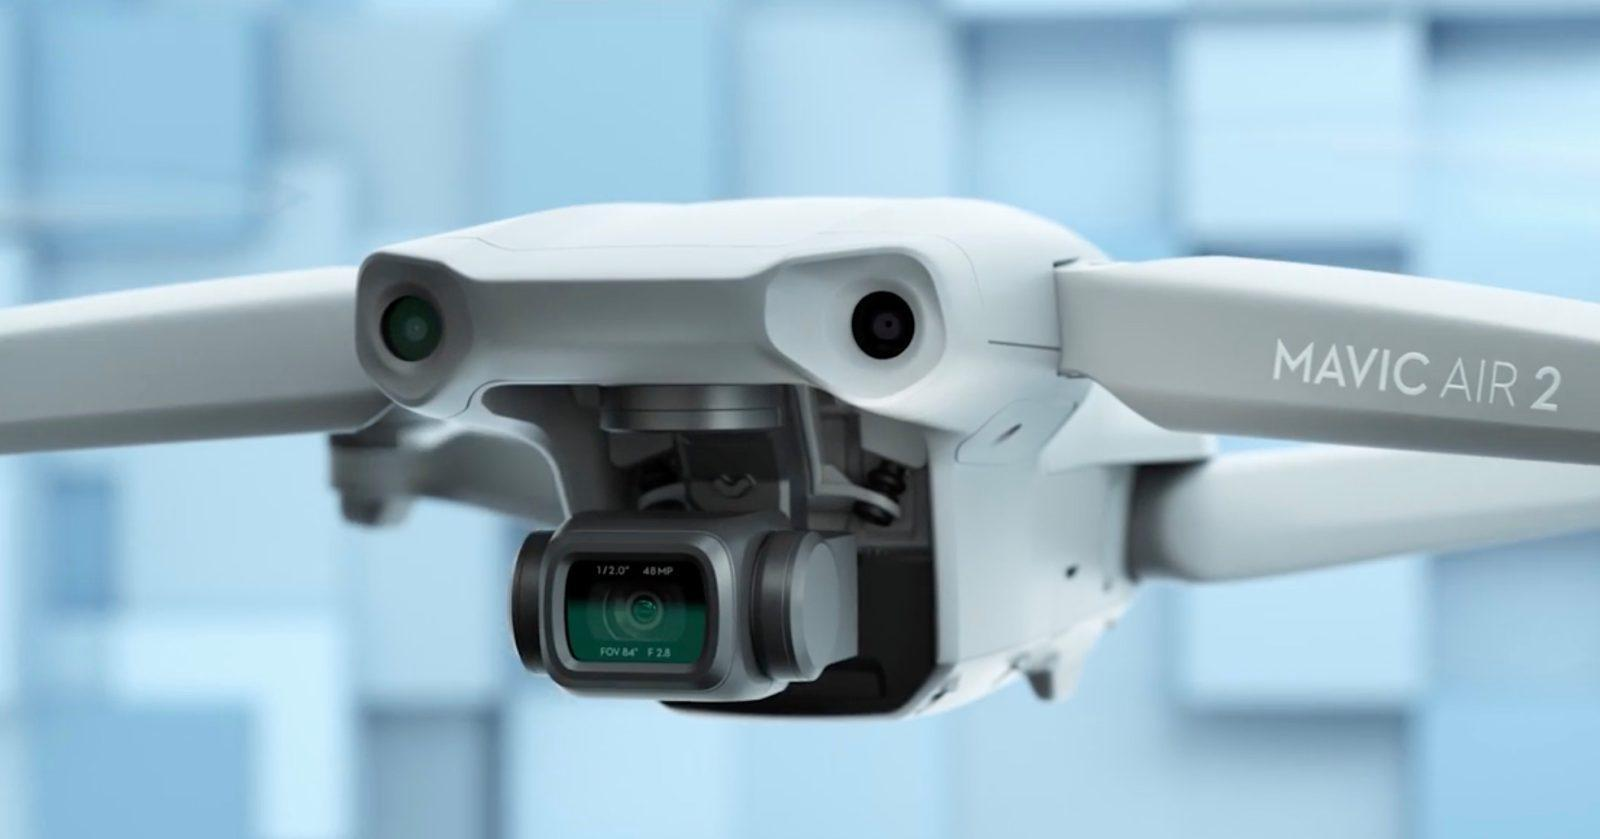 DJI выпускает складной дрон Mavic Air 2 (mavic air 2)